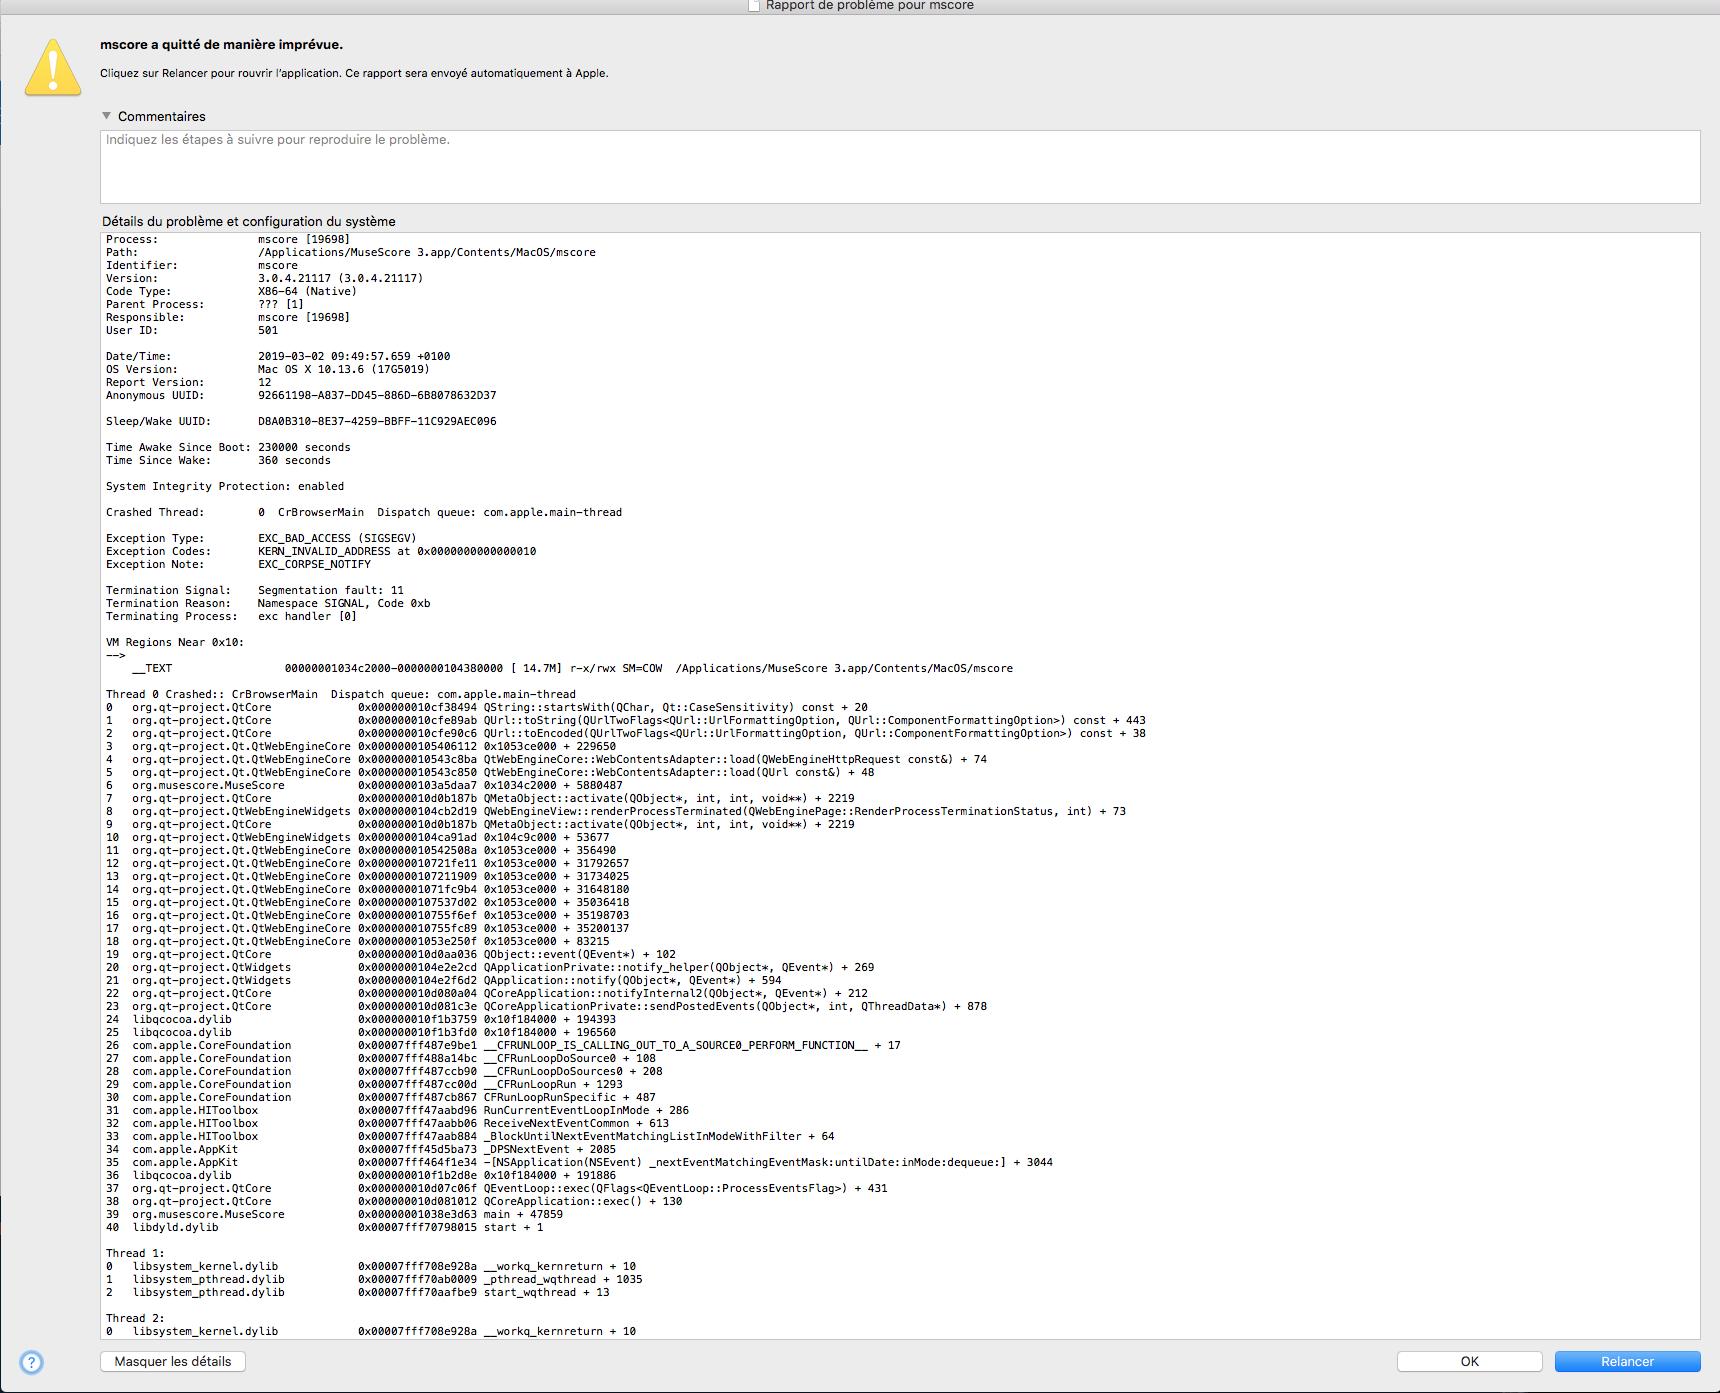 MuseScore 3 0 4 on macOS is crashing on startup  | MuseScore